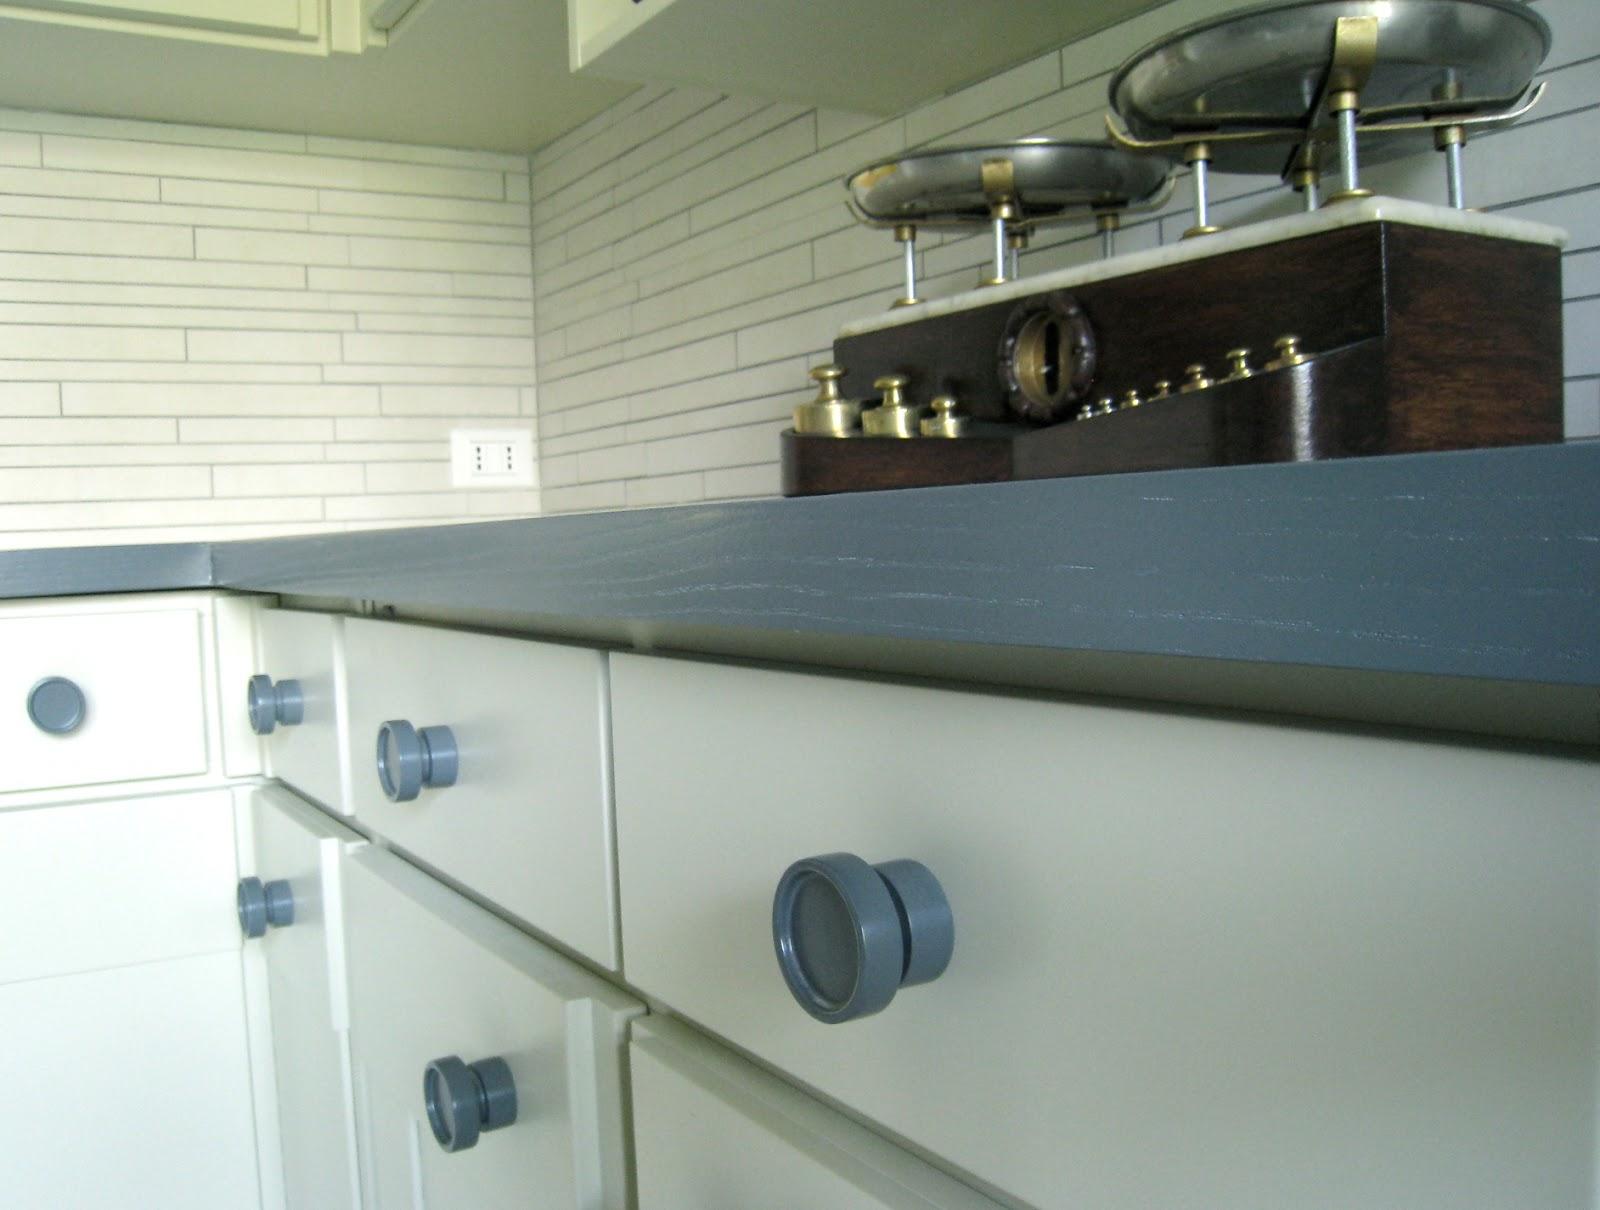 Dipingere mobili cucina vecchia gd22 regardsdefemmes - Rinnovare mobili cucina ...